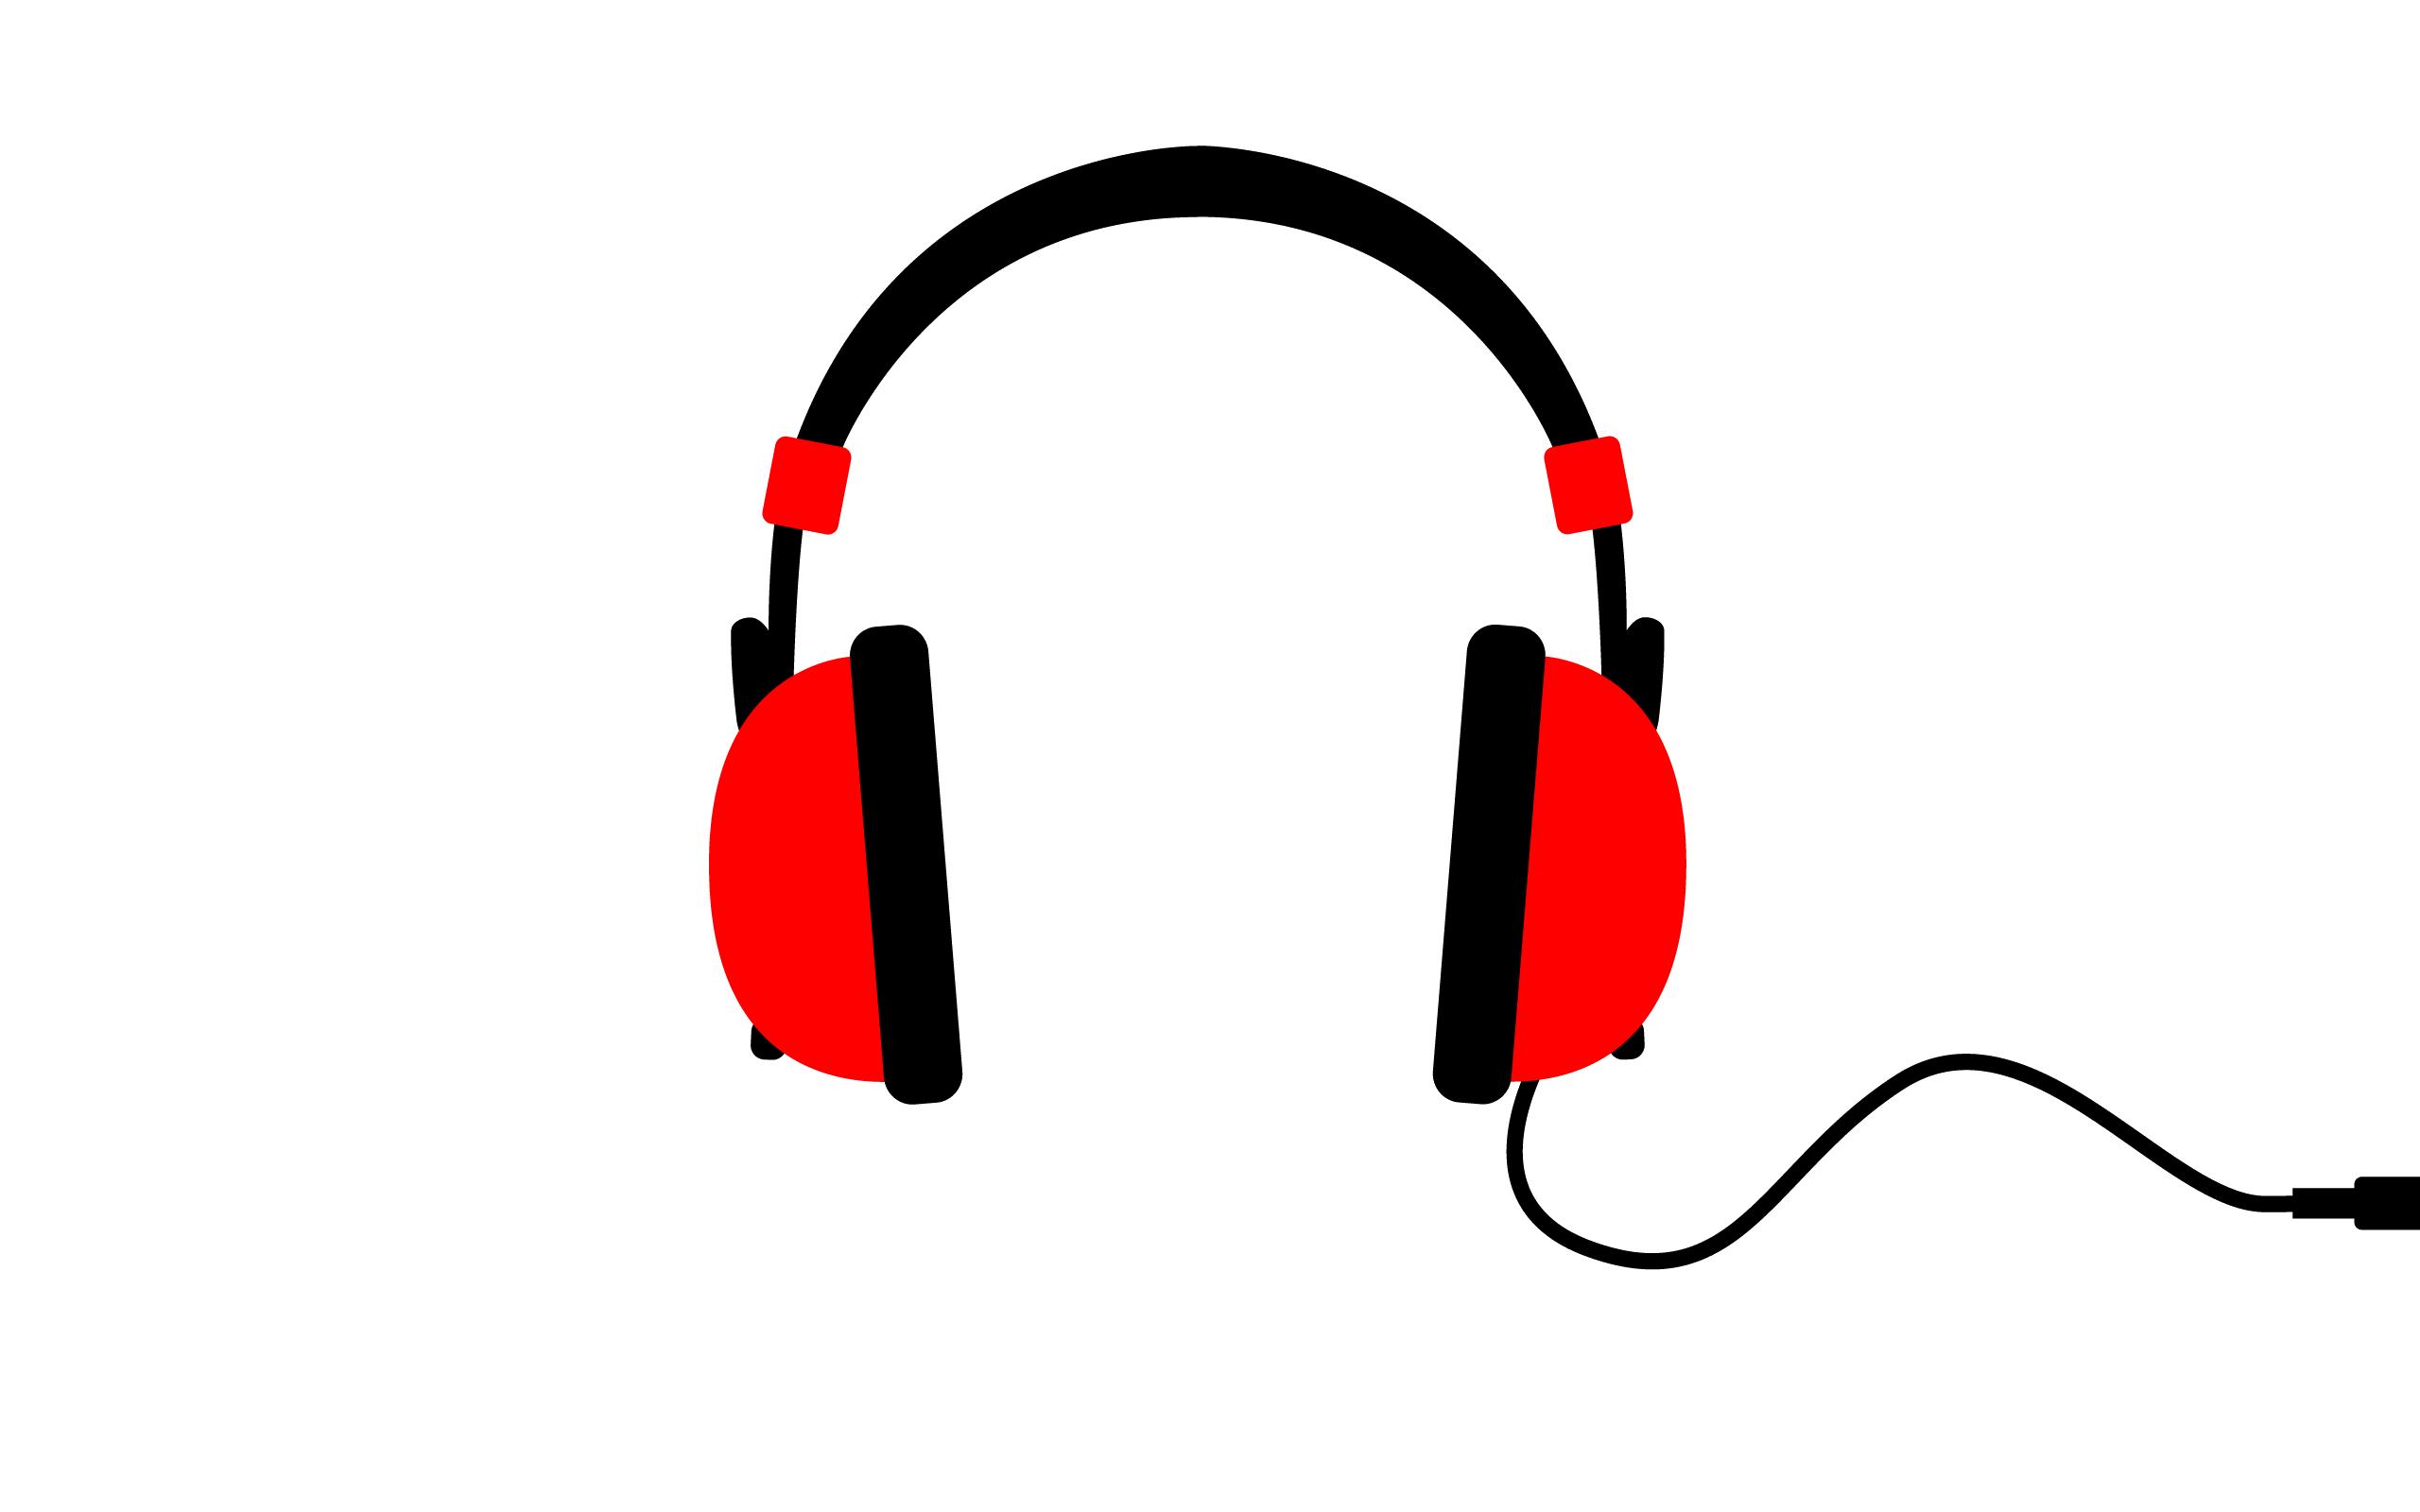 download headphones clipart hq png image freepngimg bulldogs clip art free bulldog clip art free downloads